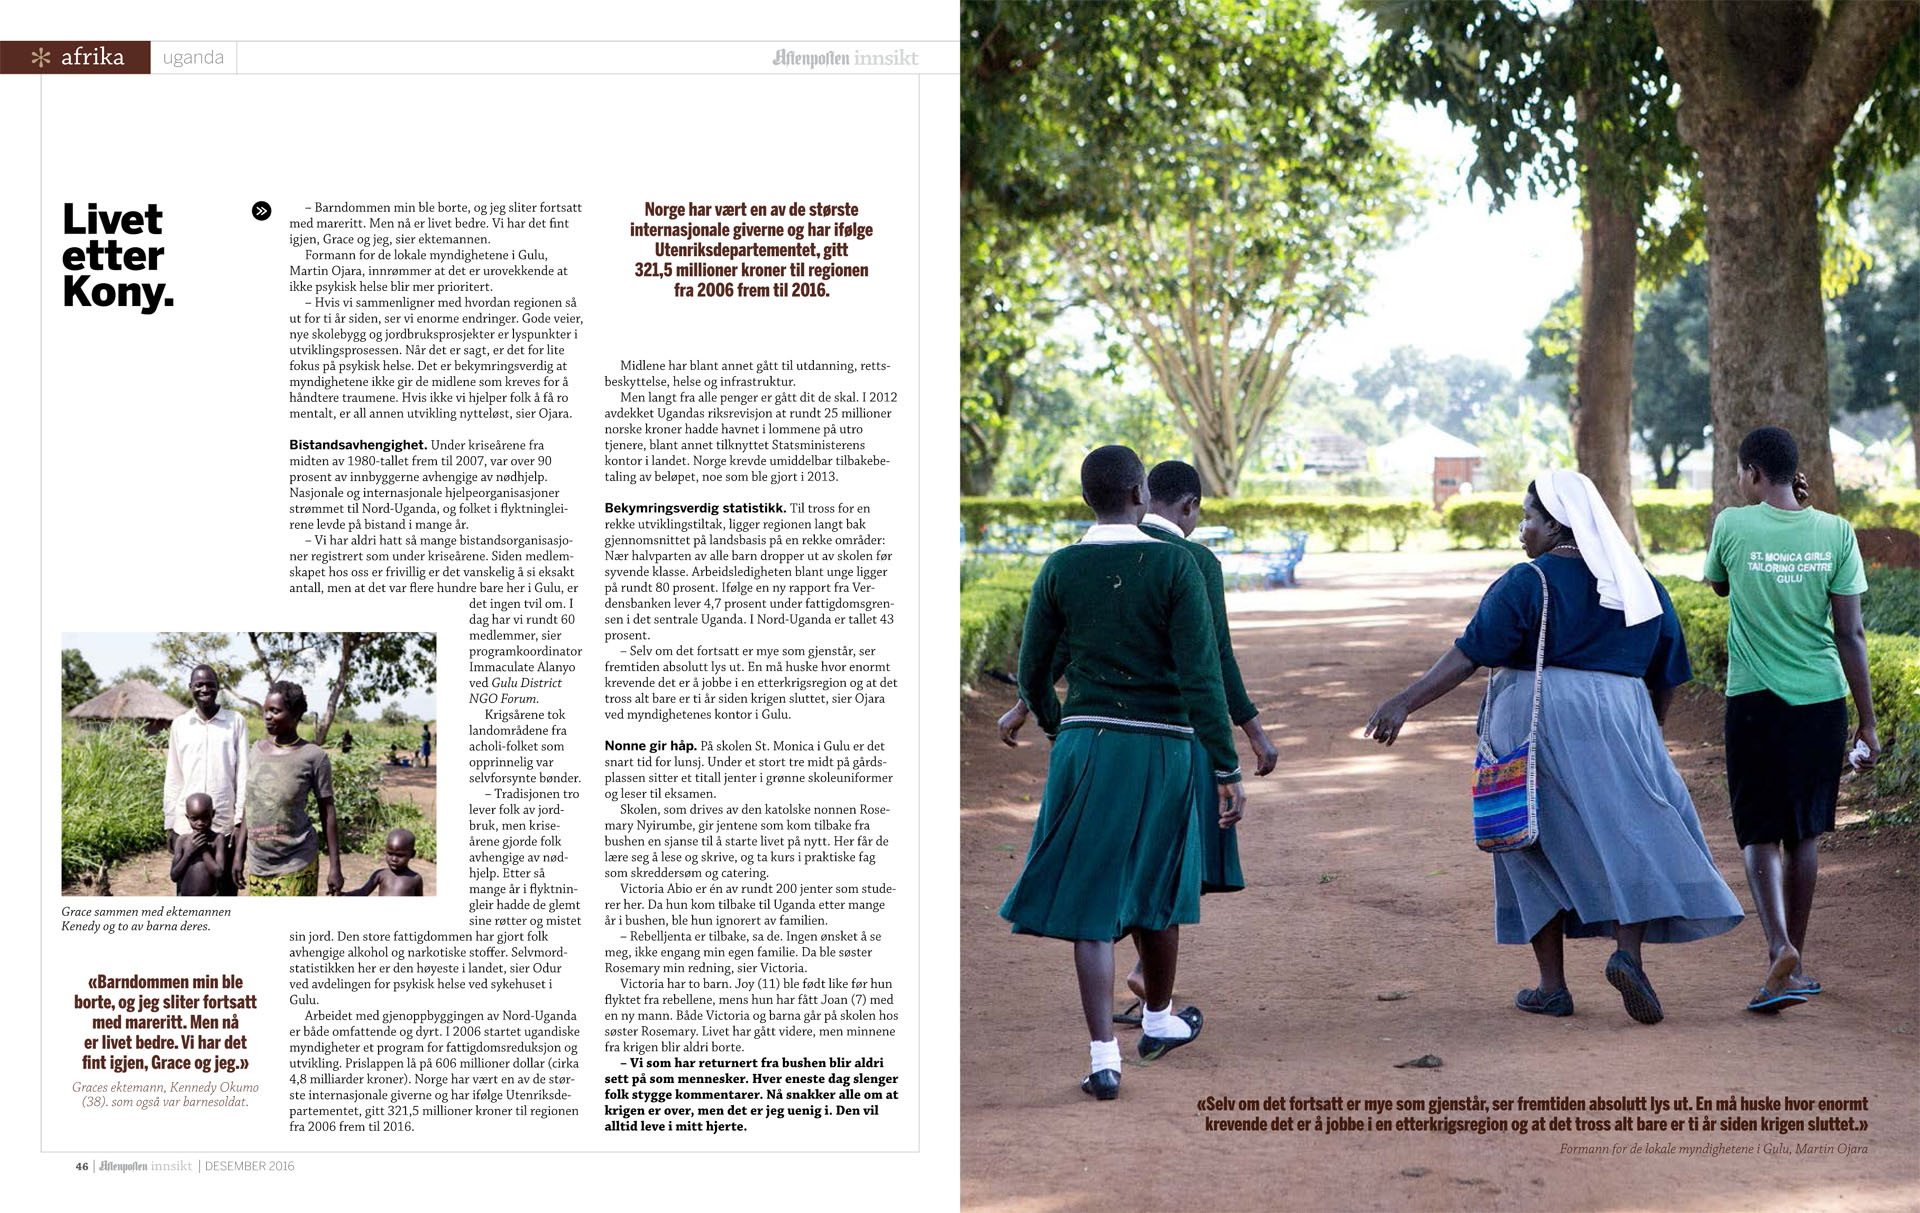 Story from Northern Uganda for Aftenposten Innsikt